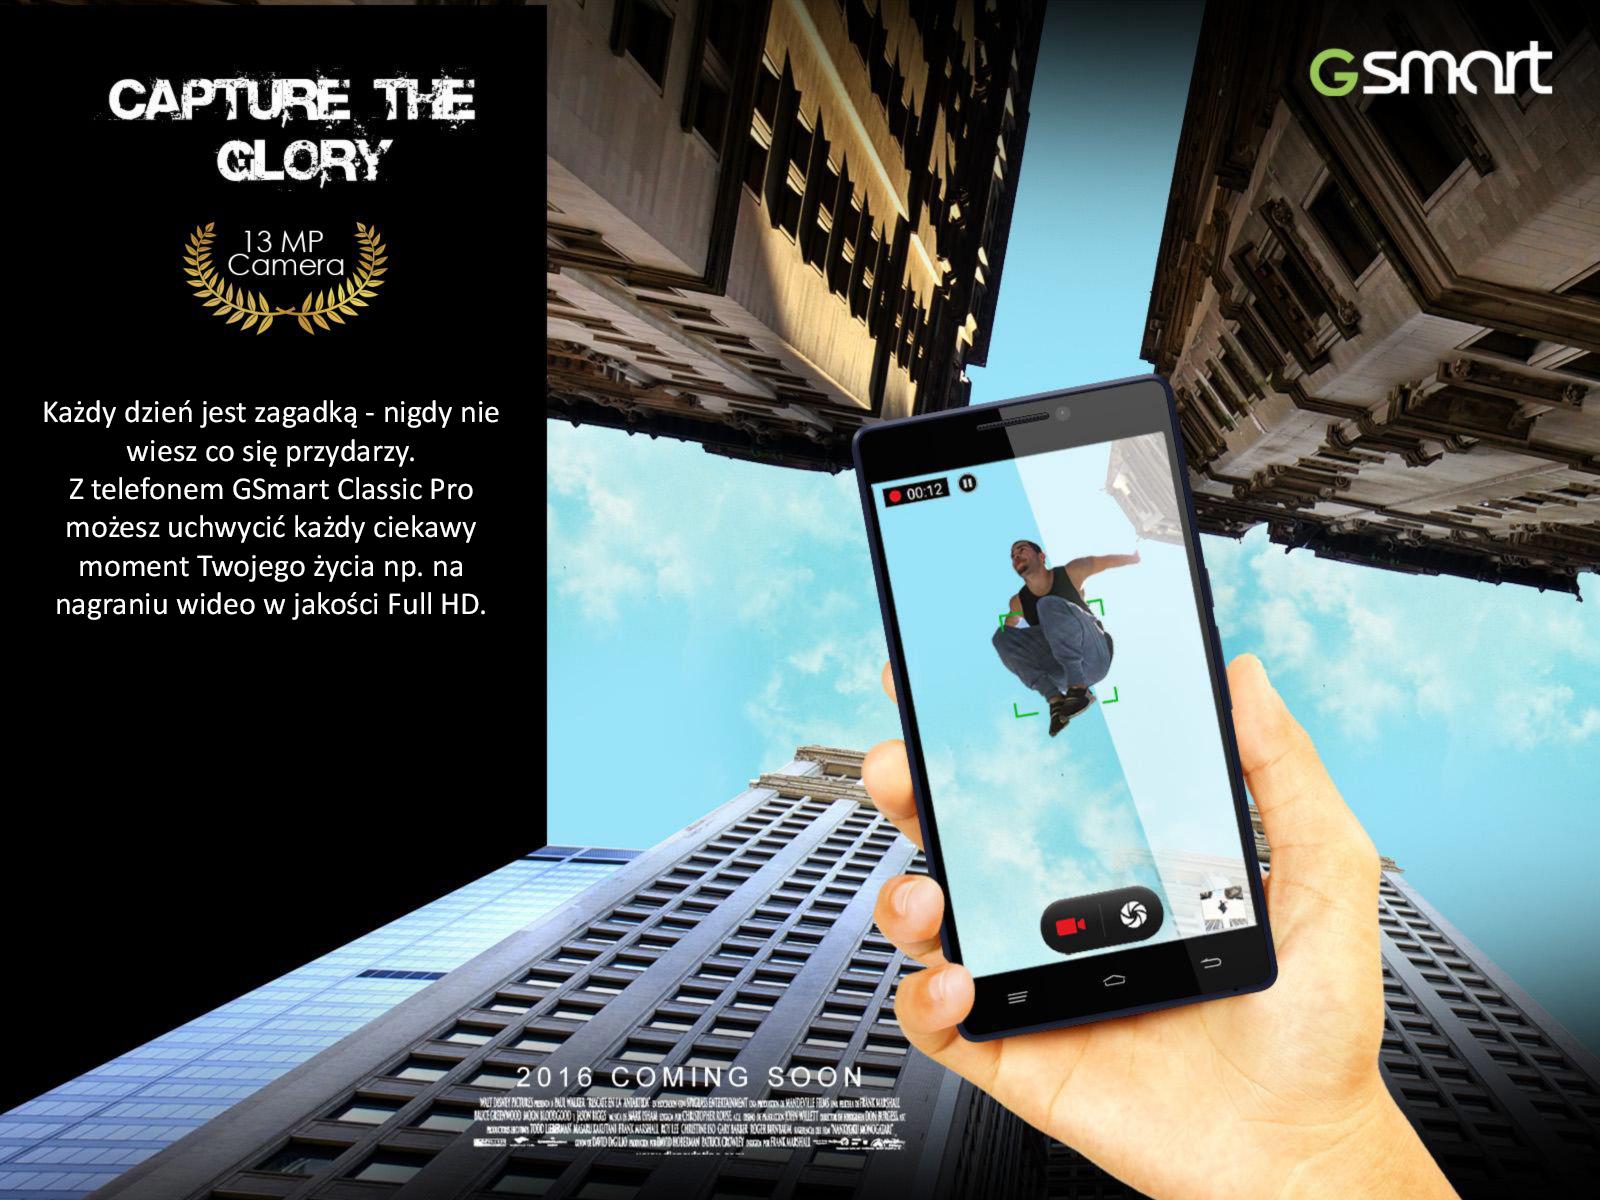 Telefon Gigabyte Gsmart Classic Pro